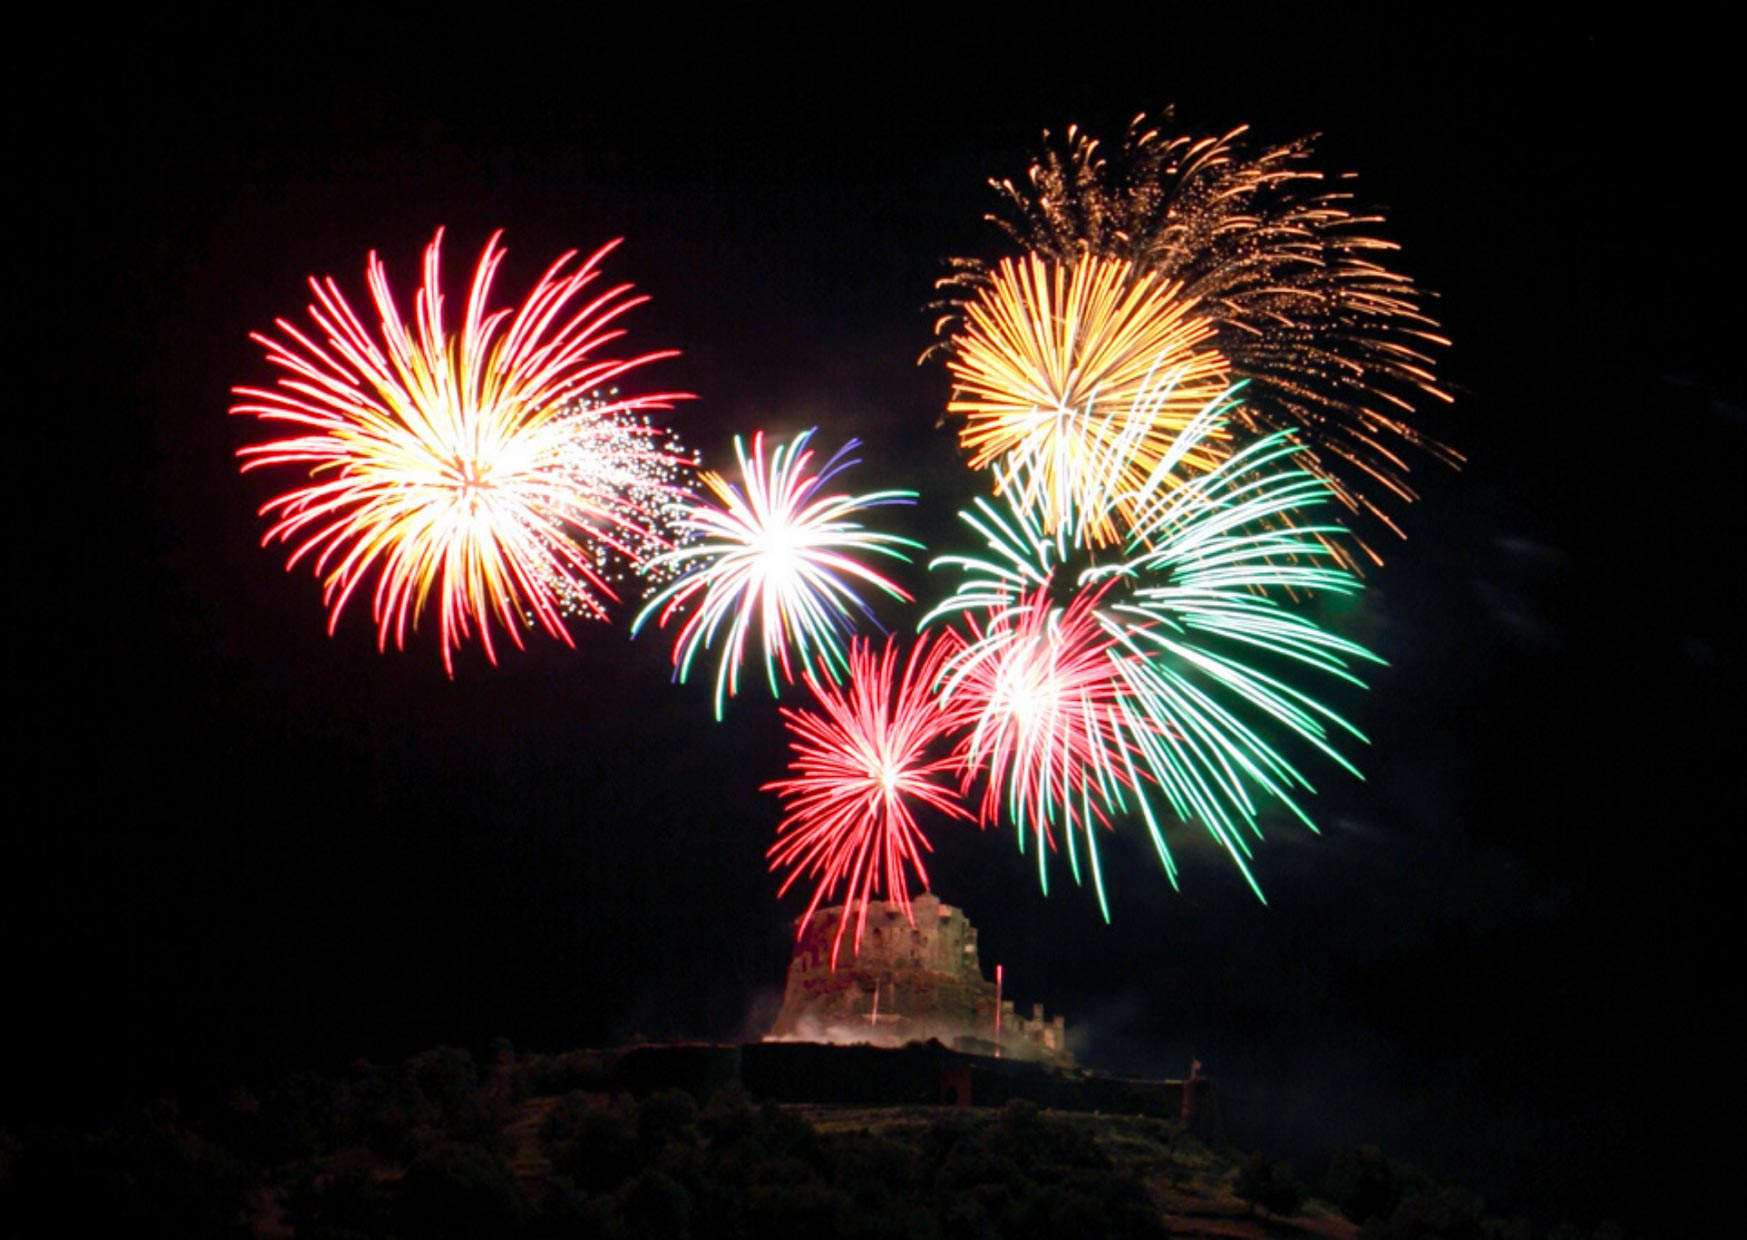 Feu d'artifice chateau de Murol : 14 juillet 2020